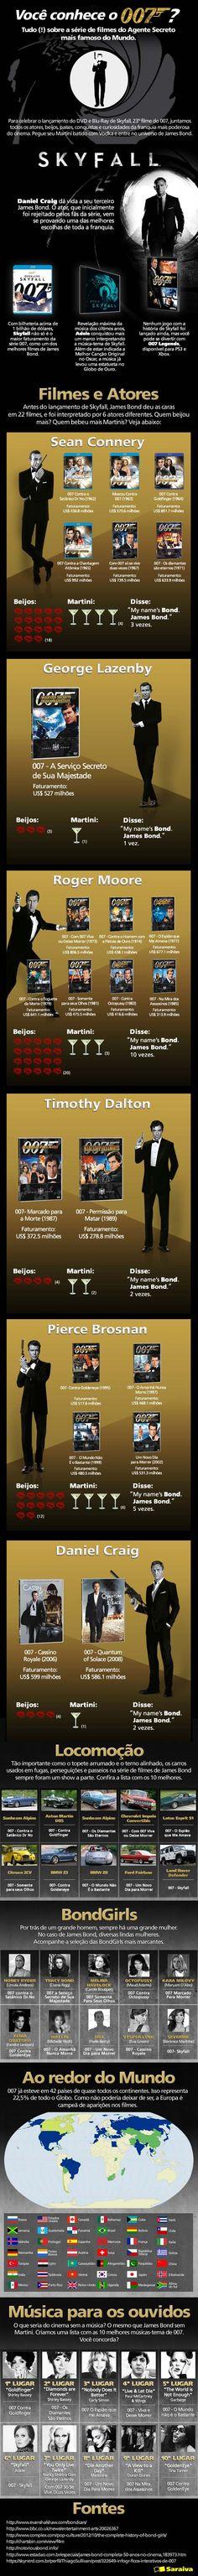 Infográfico 007!